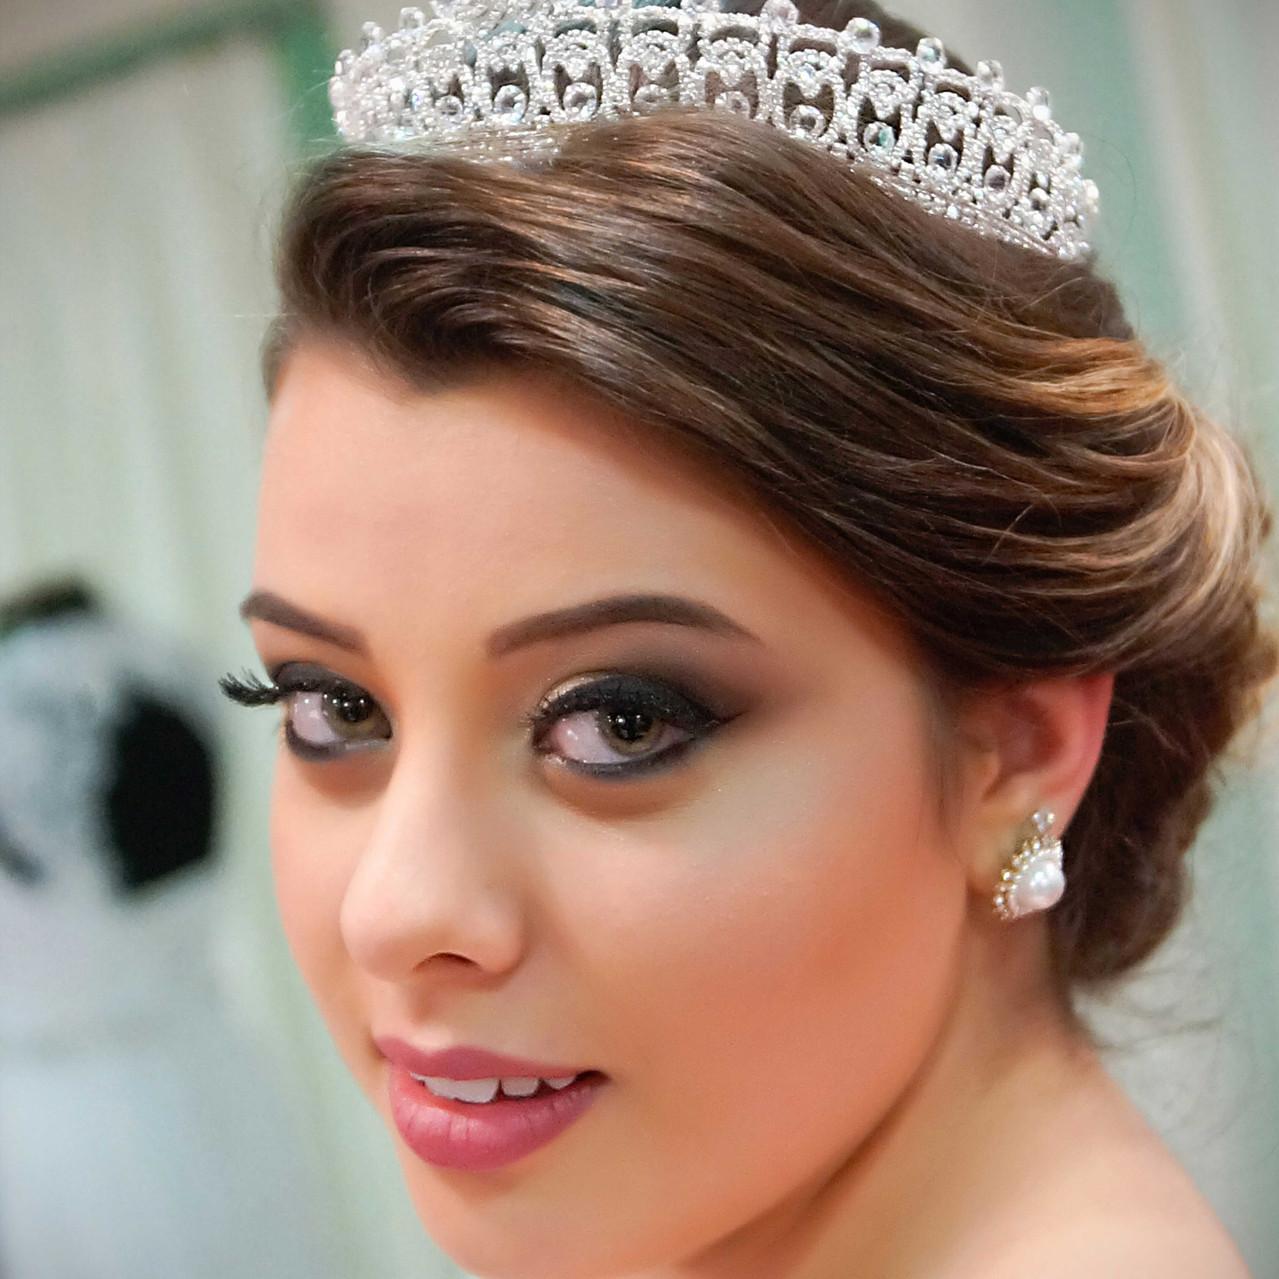 Modelo: Larissa  Make up and Hair: Sandra Costa  Assist. Beleza: Larissa Keiko